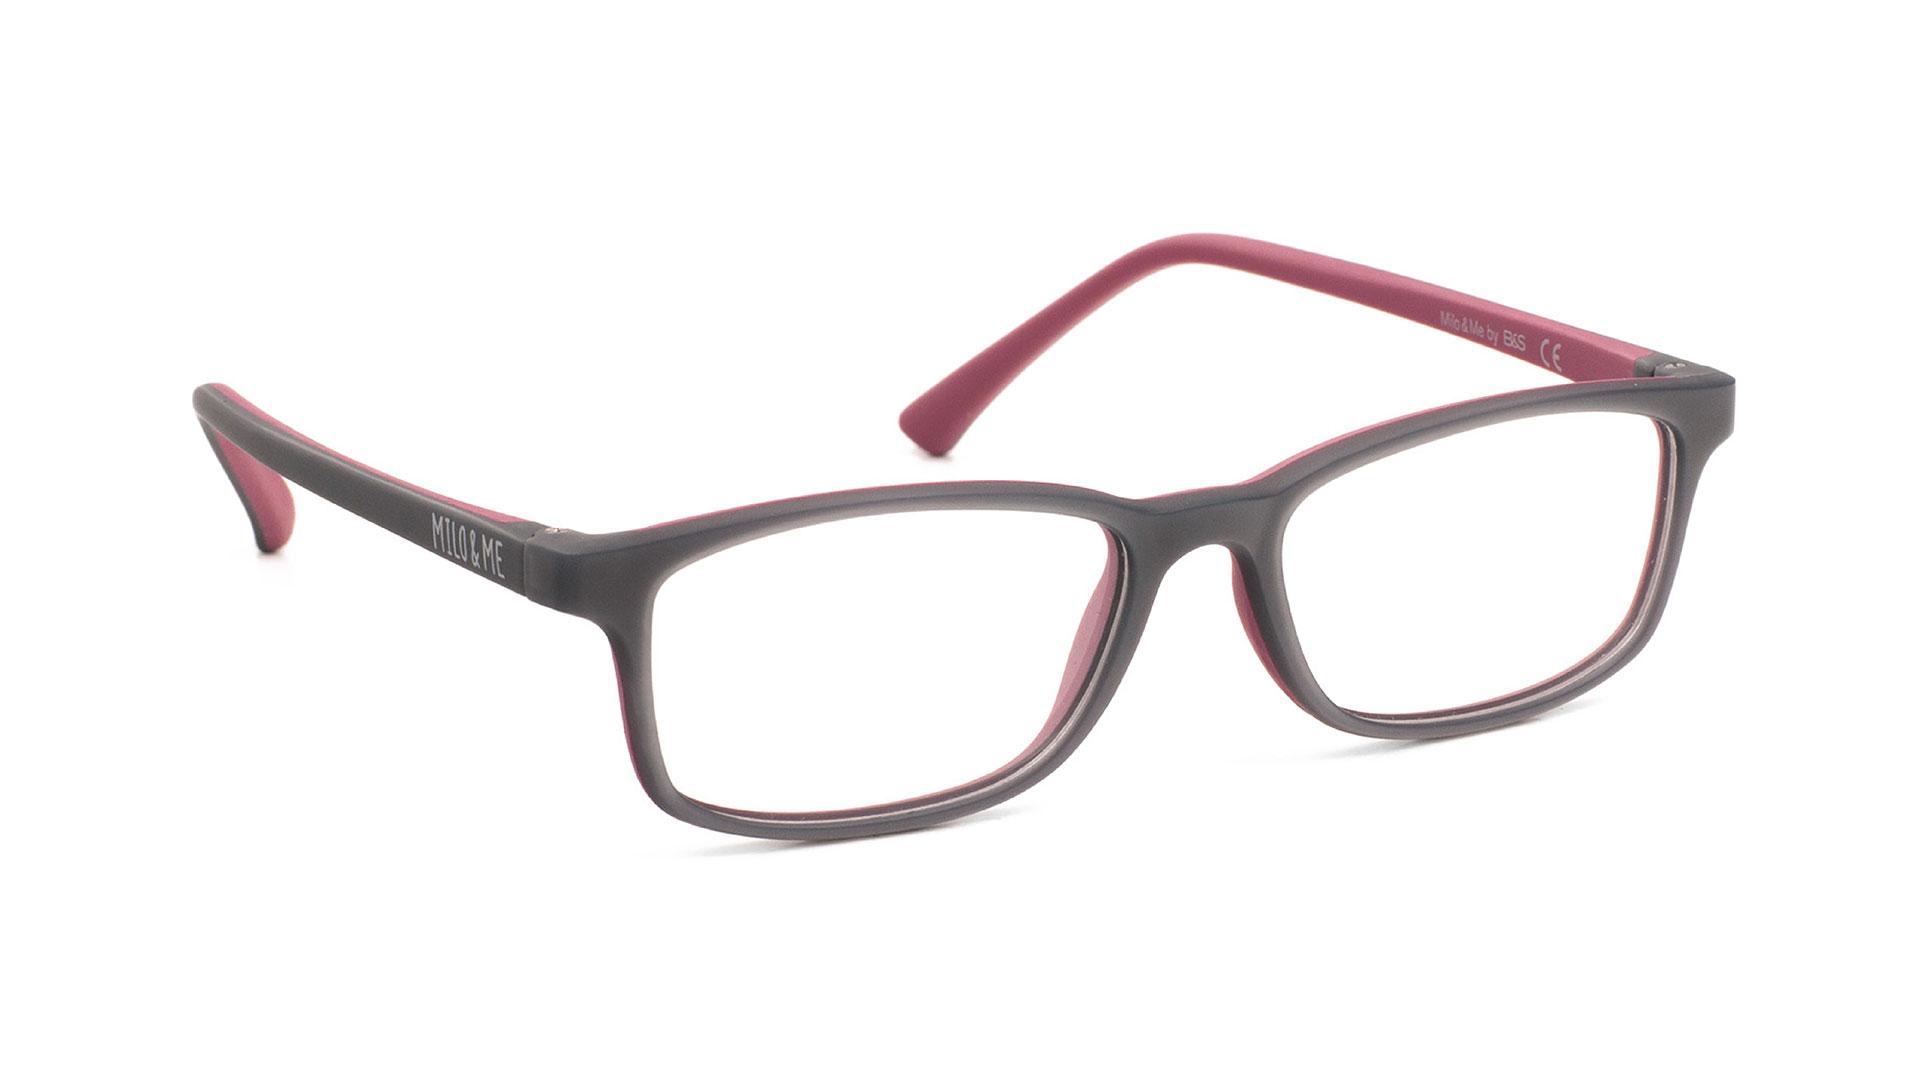 Grey Blackberry H85031-22 - Milo & Me Eyewear - Optimum RX Lens Specialists